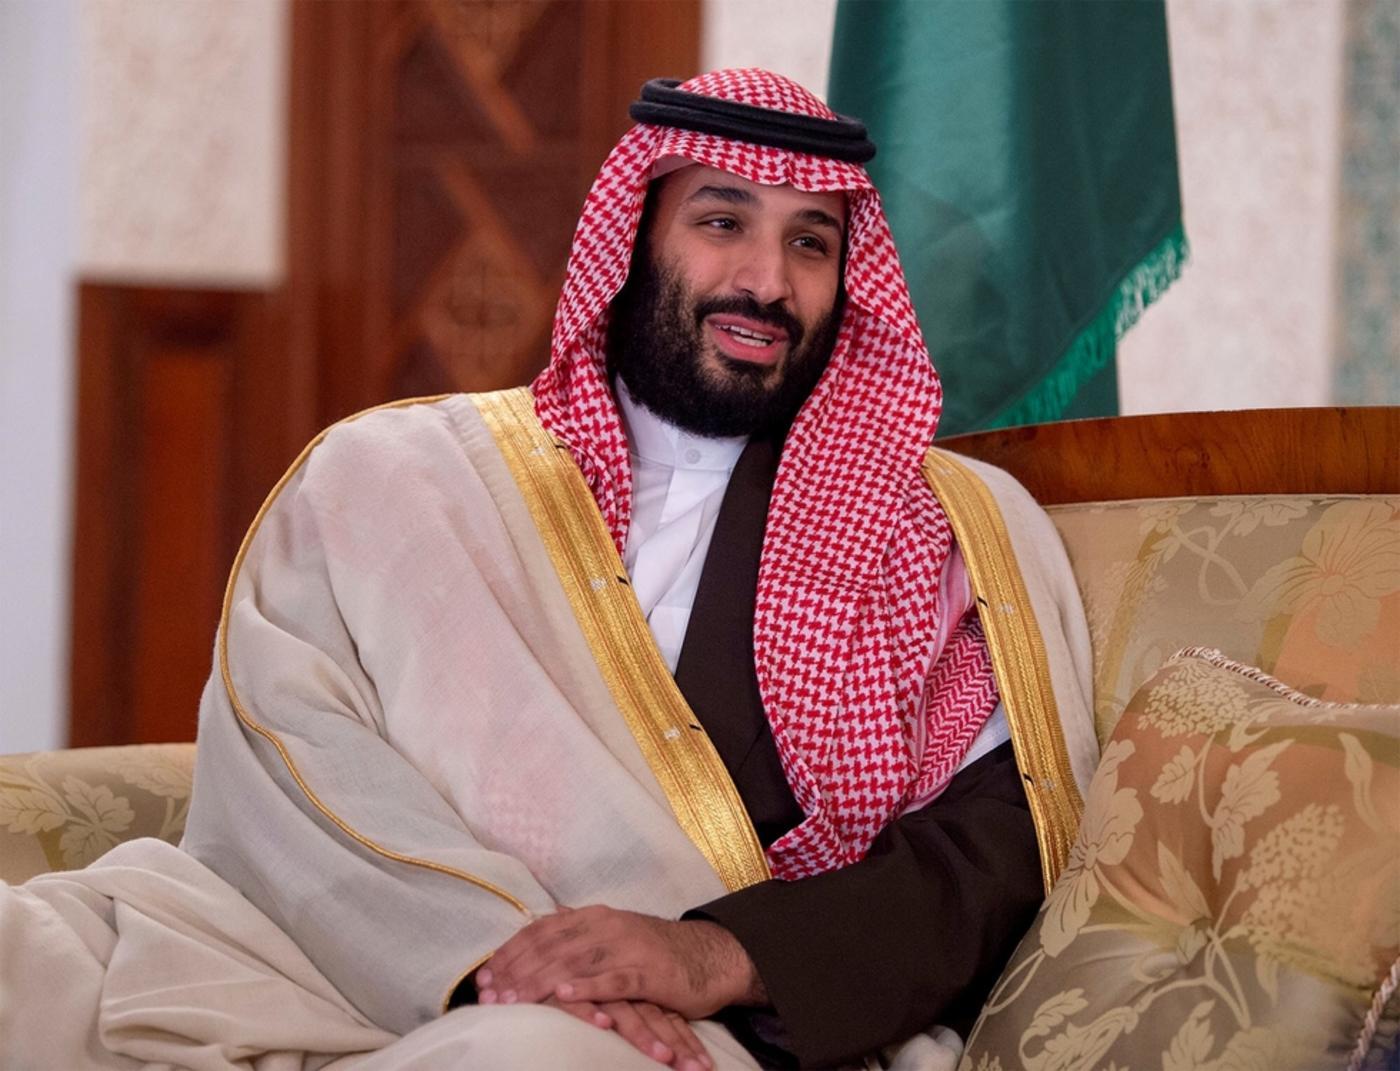 Resultado de imagen de Mohammad bin Salman (MbS)